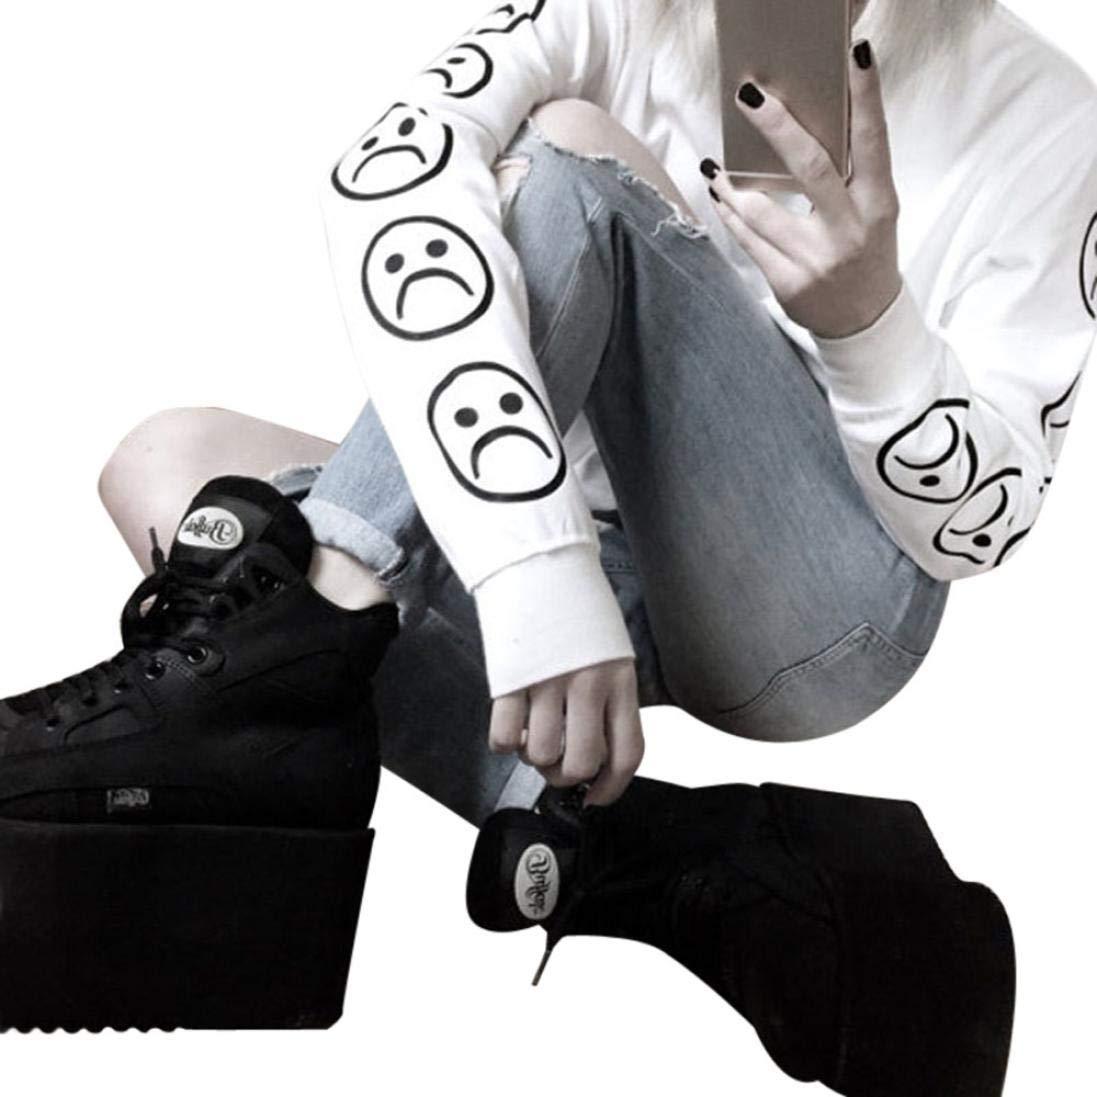 Snowfoller Sad Face Printed Sweatshirt,Women Long Sleeve O-Neck Black Black Tee T-Shirts Fashion Autumn Blouse